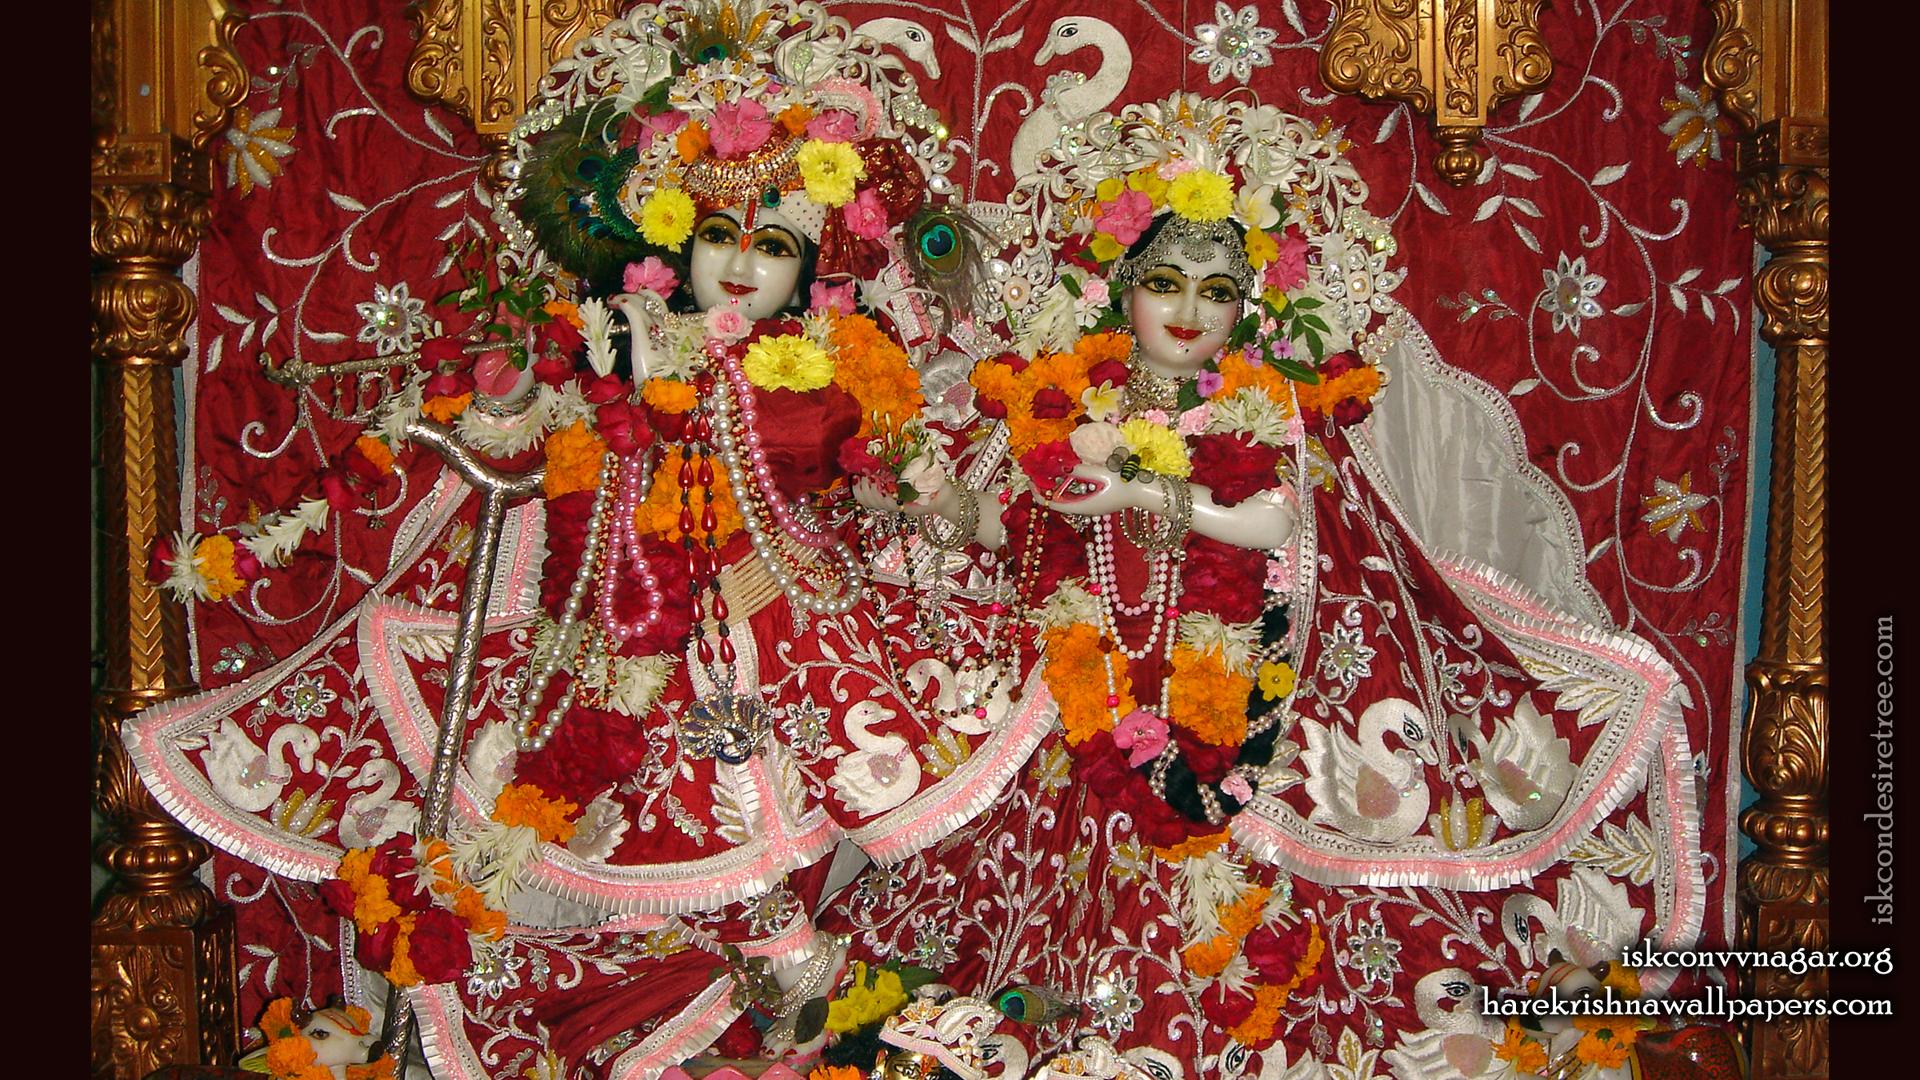 Sri Sri Radha Giridhari Wallpaper (012) Size 1920x1080 Download